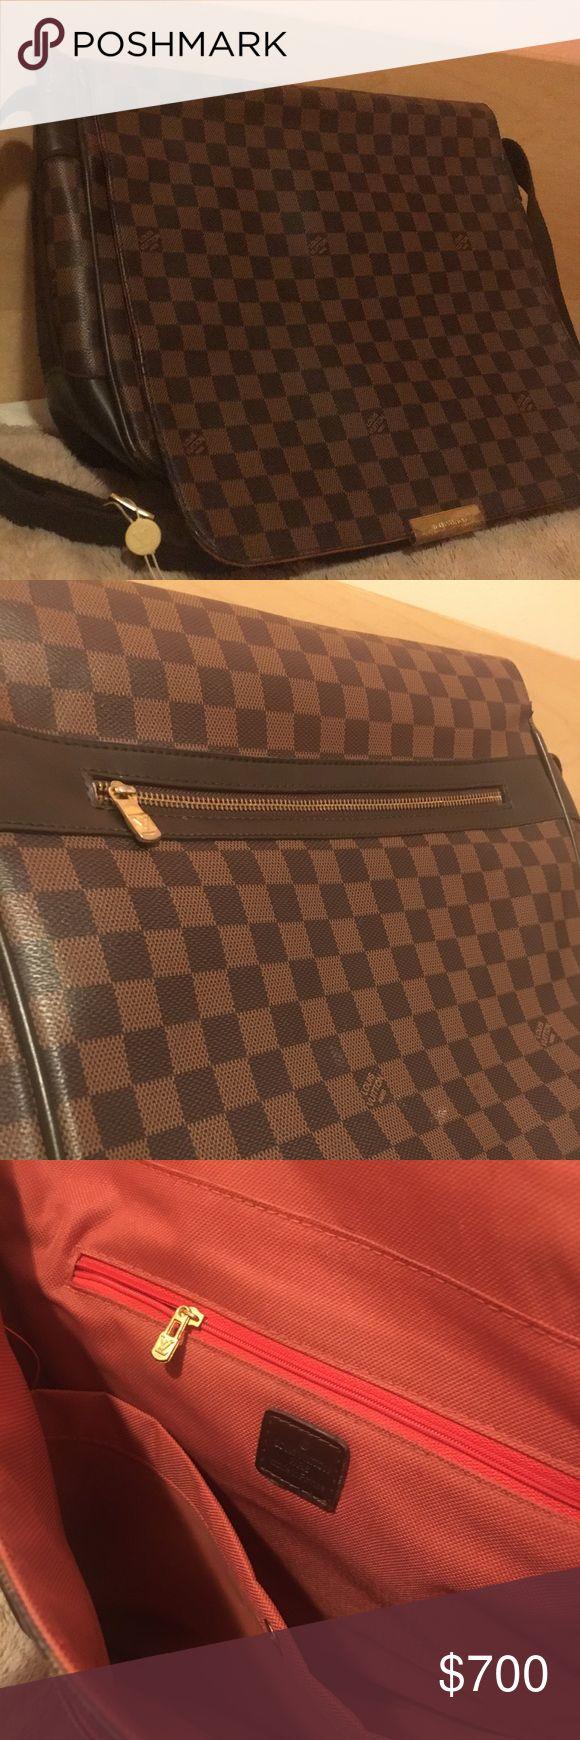 Louis Vuitton Messenger Bag Louis Vuitton bag large enough to double as a laptop bag. Gently worn on exterior hardware. Louis Vuitton Bags Satchels